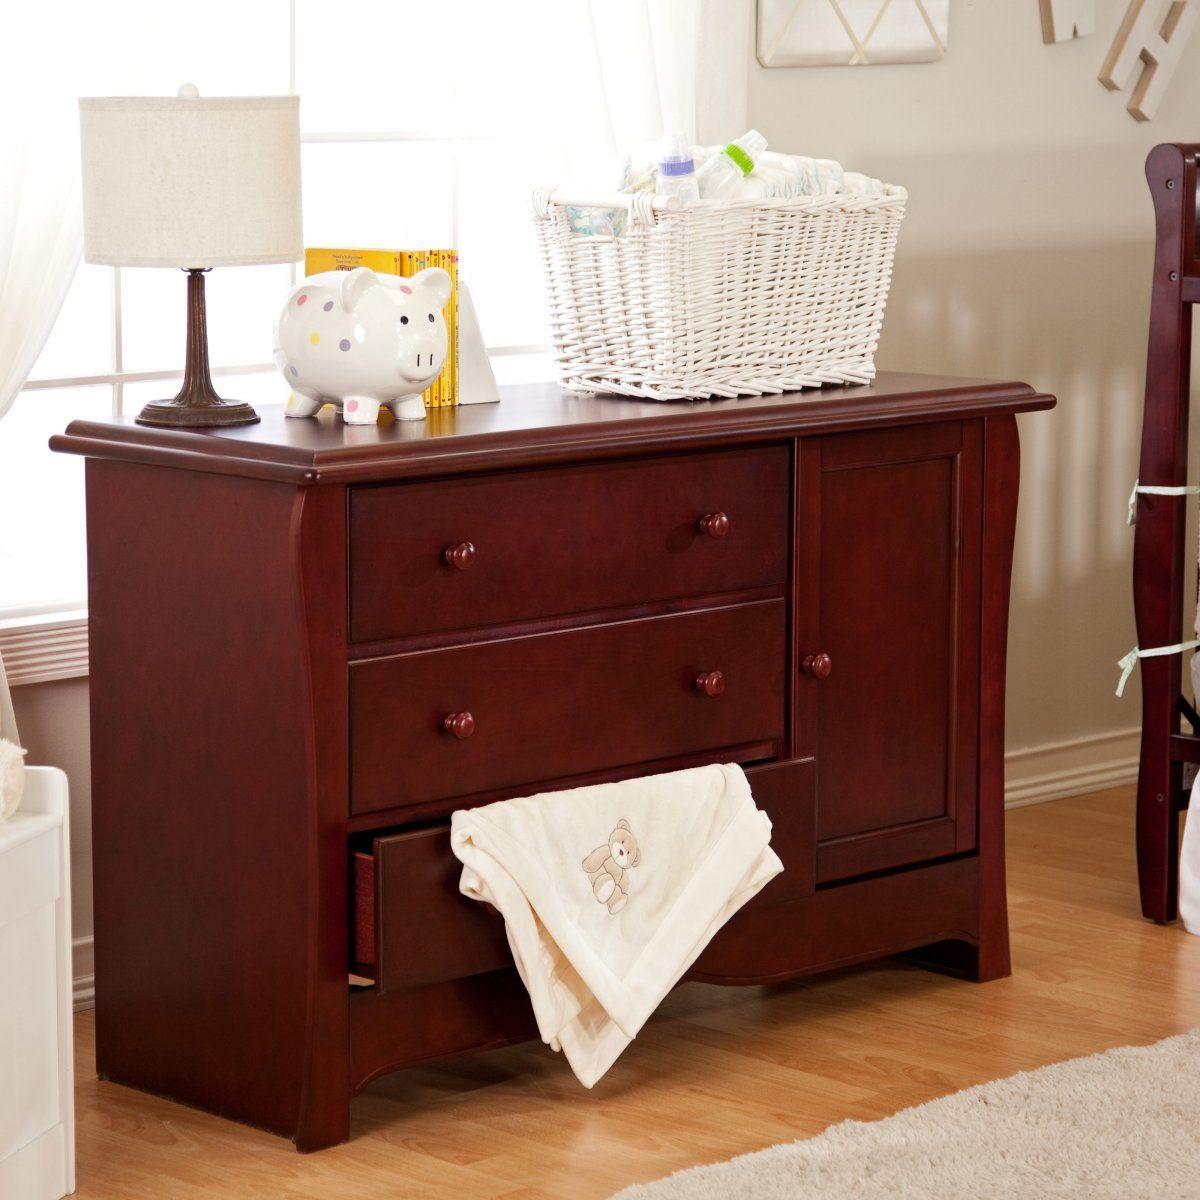 Oak Changing Table Dresser Baby